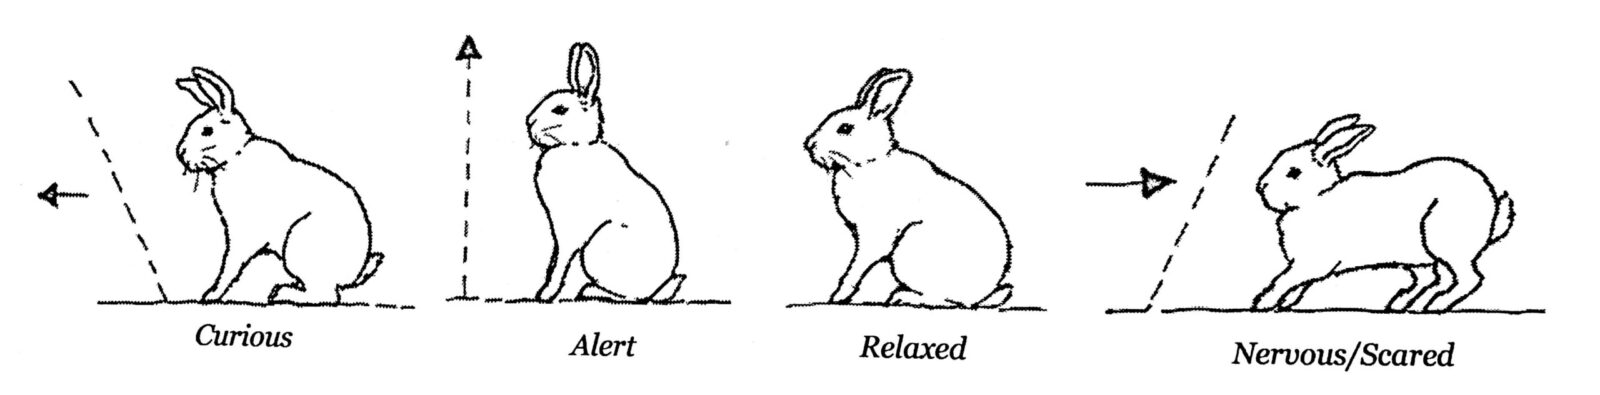 kanin kropssprog2